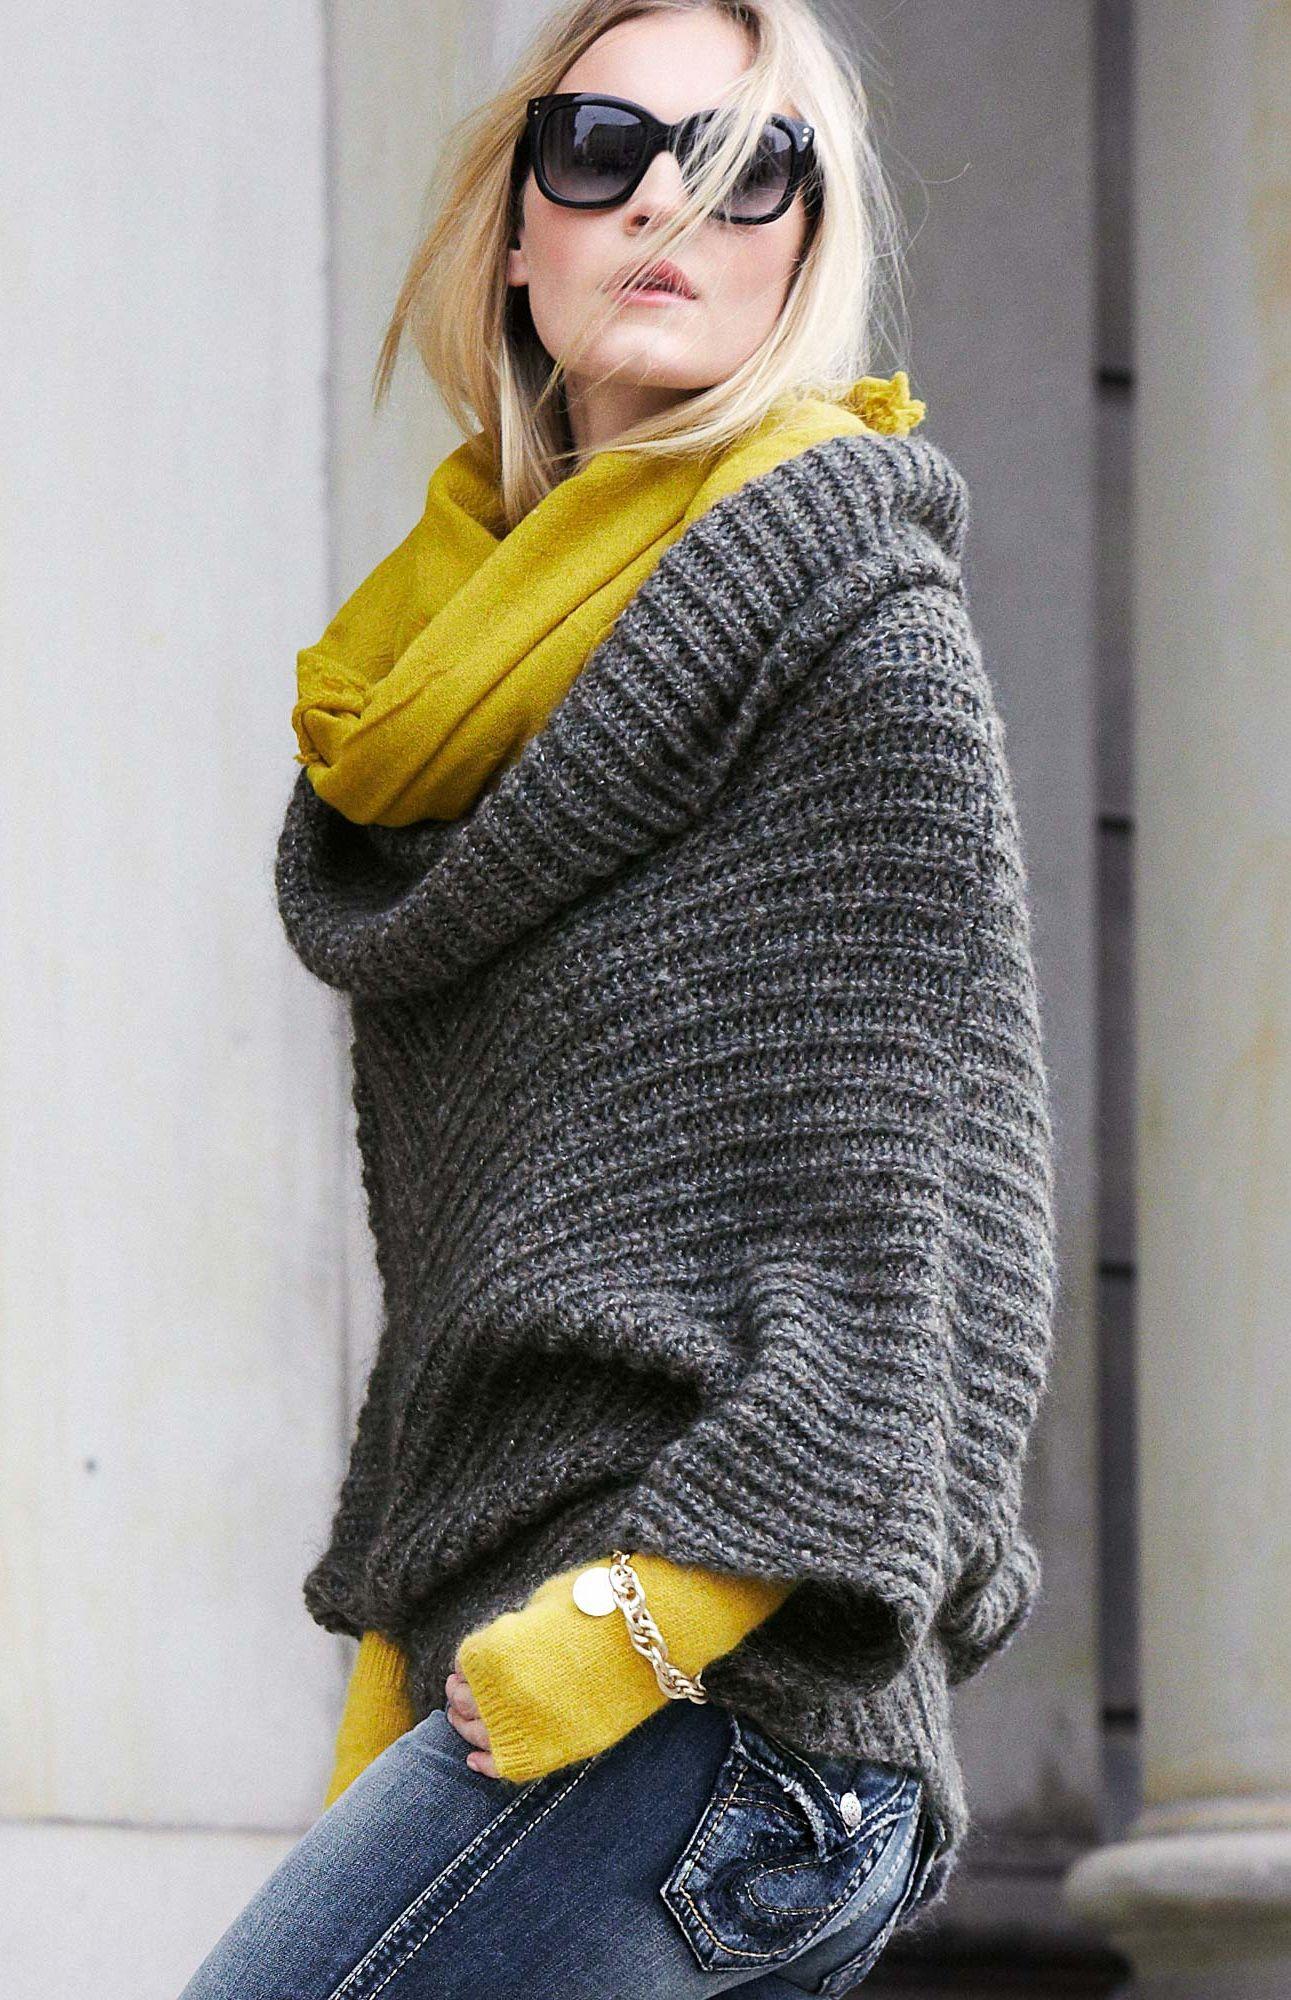 Sweater Sweater Coat #topsweater #anoukblokker #SweaterCoat #Sweater #Coat #fashioncoat  www.2dayslook.com